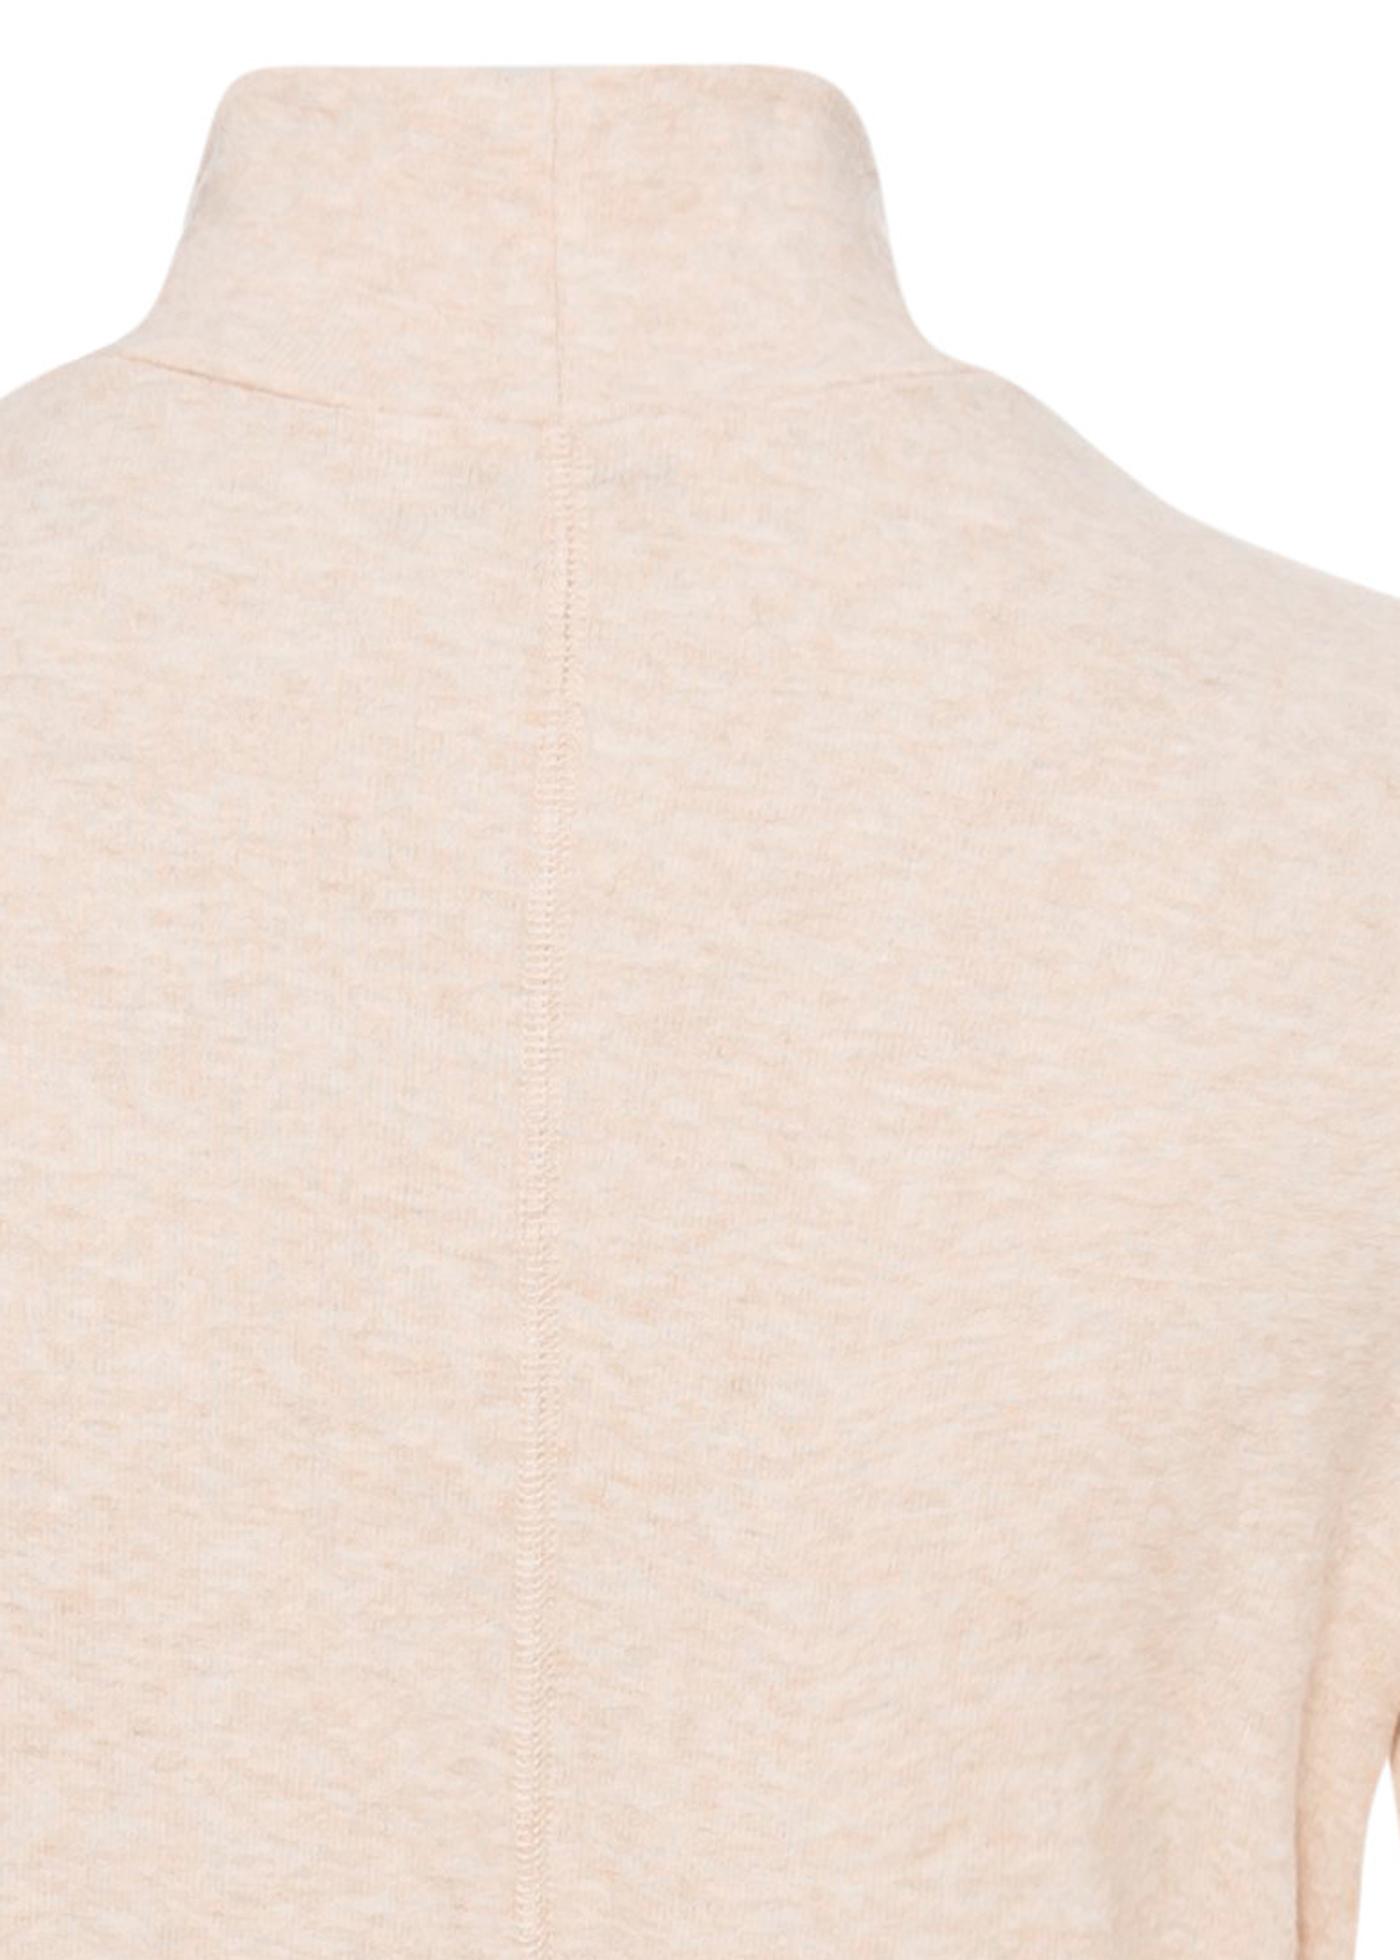 L/S TURTLENECK DRESS / L/S TURTLENECK DRESS image number 3